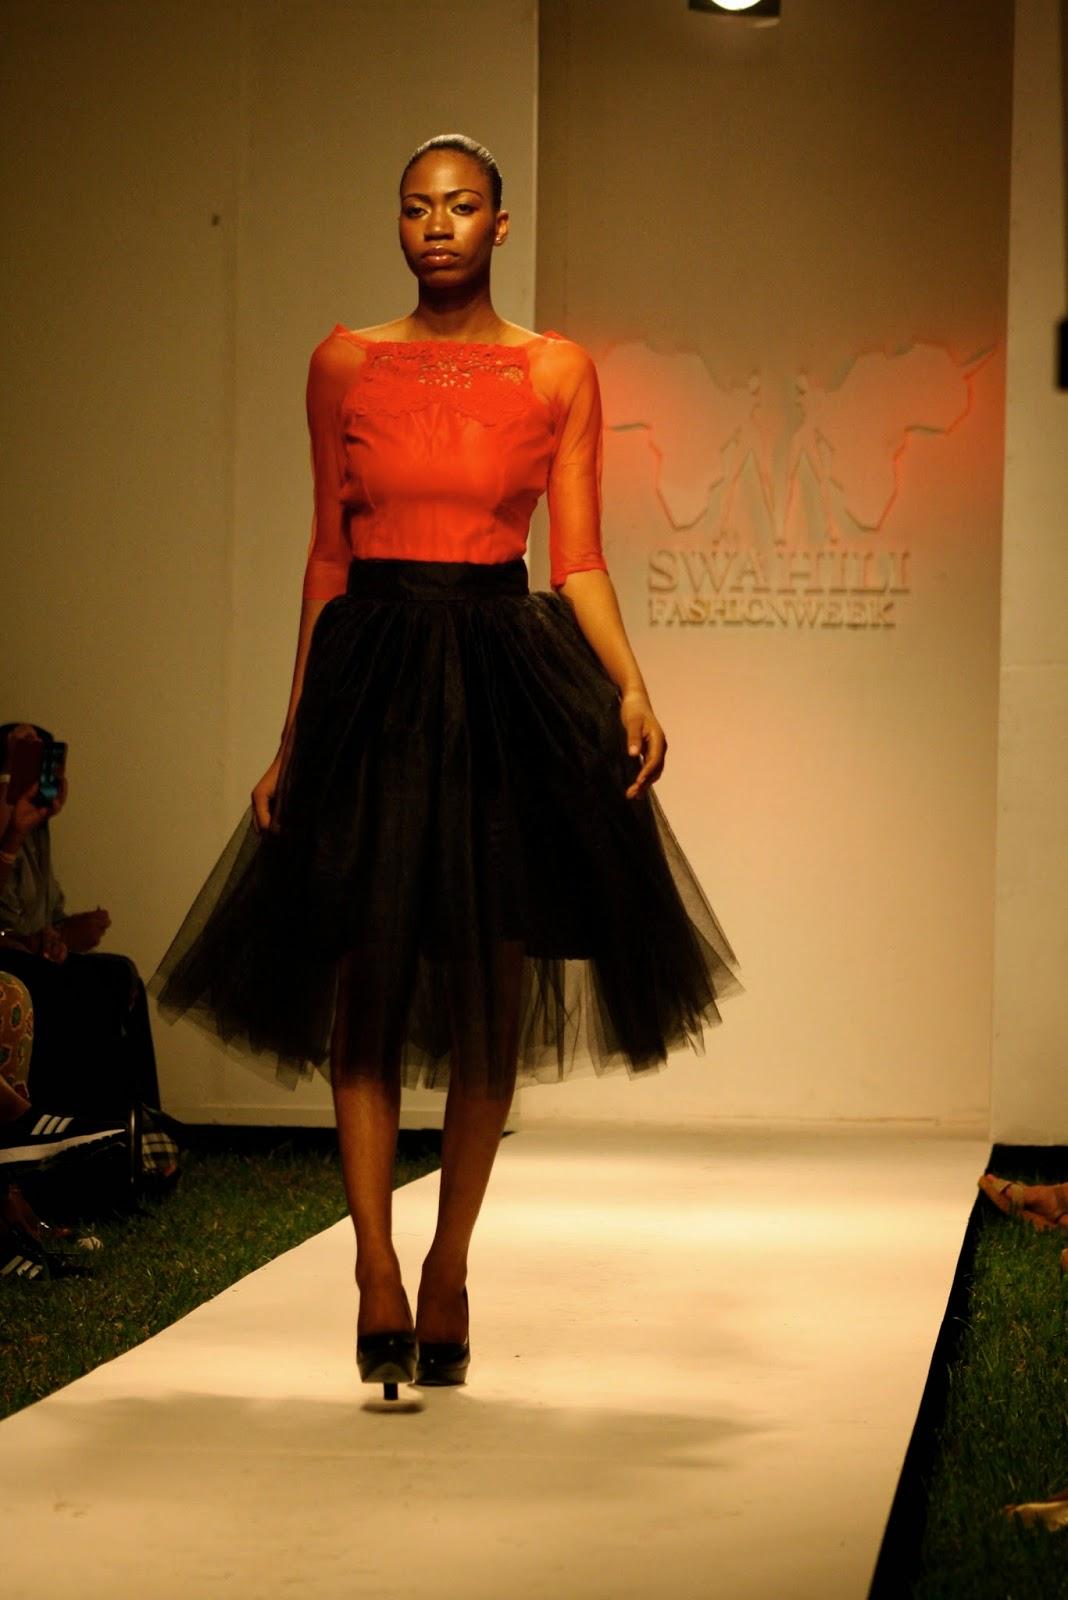 S s fashion terrell tx 86